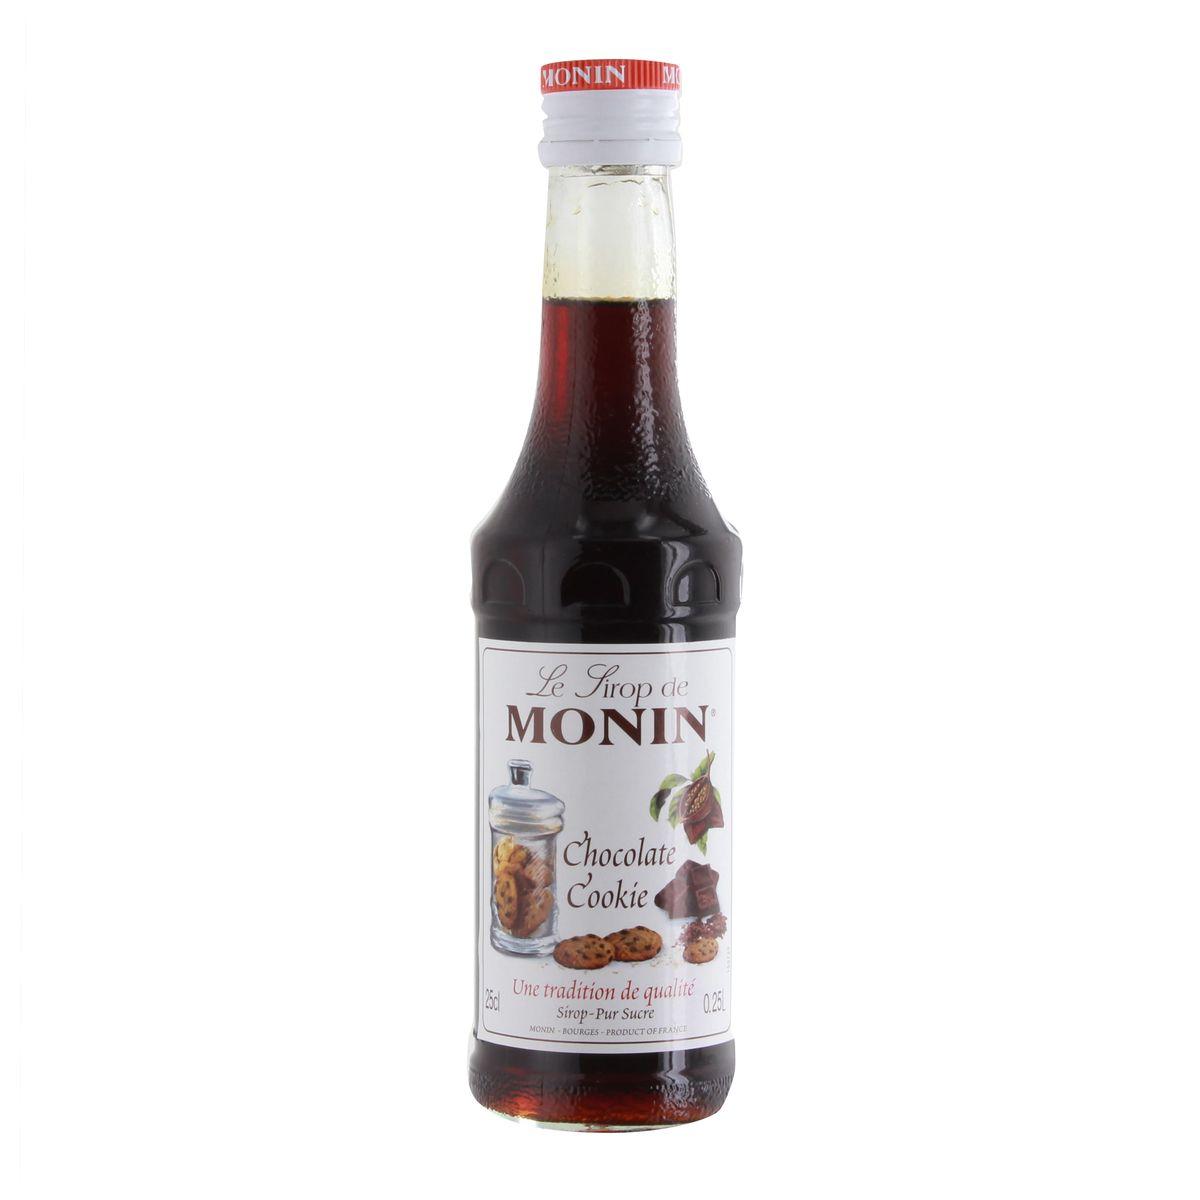 Sirop chocolate cookie 25cl - Monin